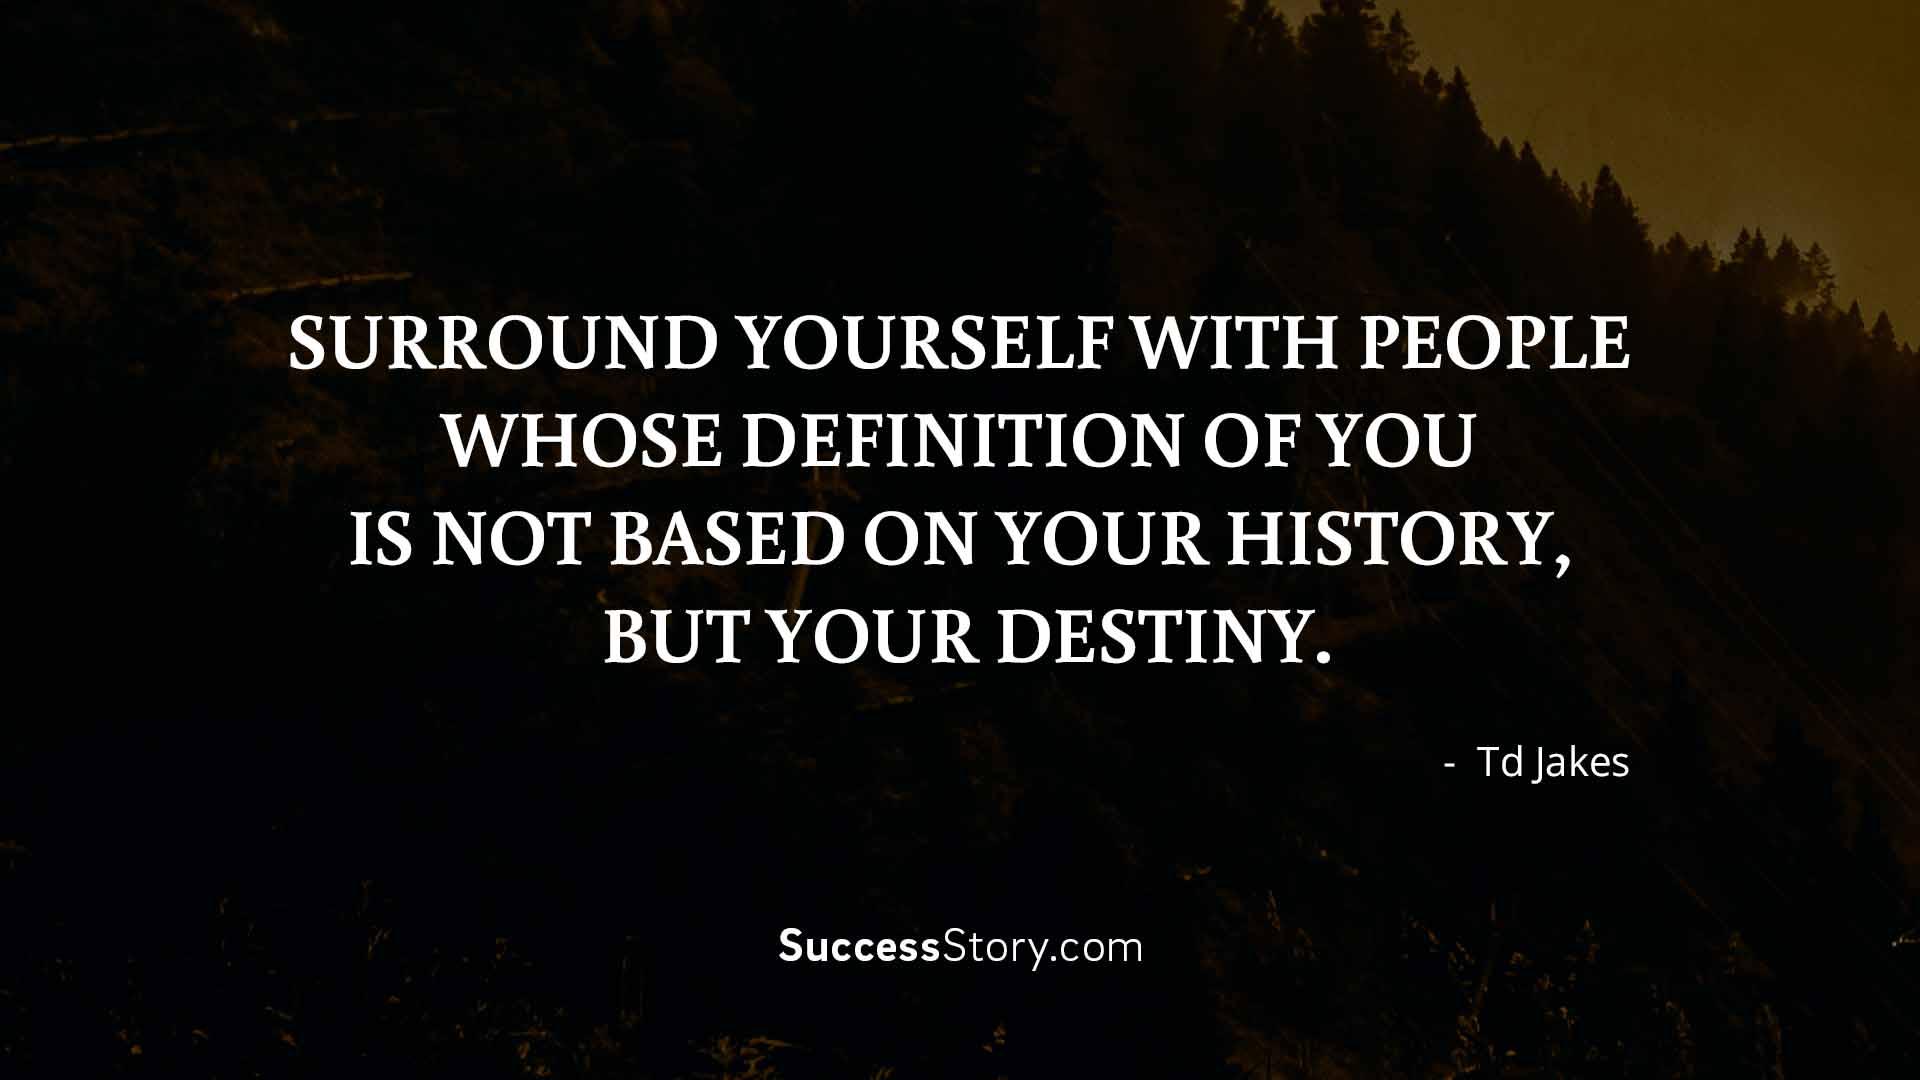 Surround yourself